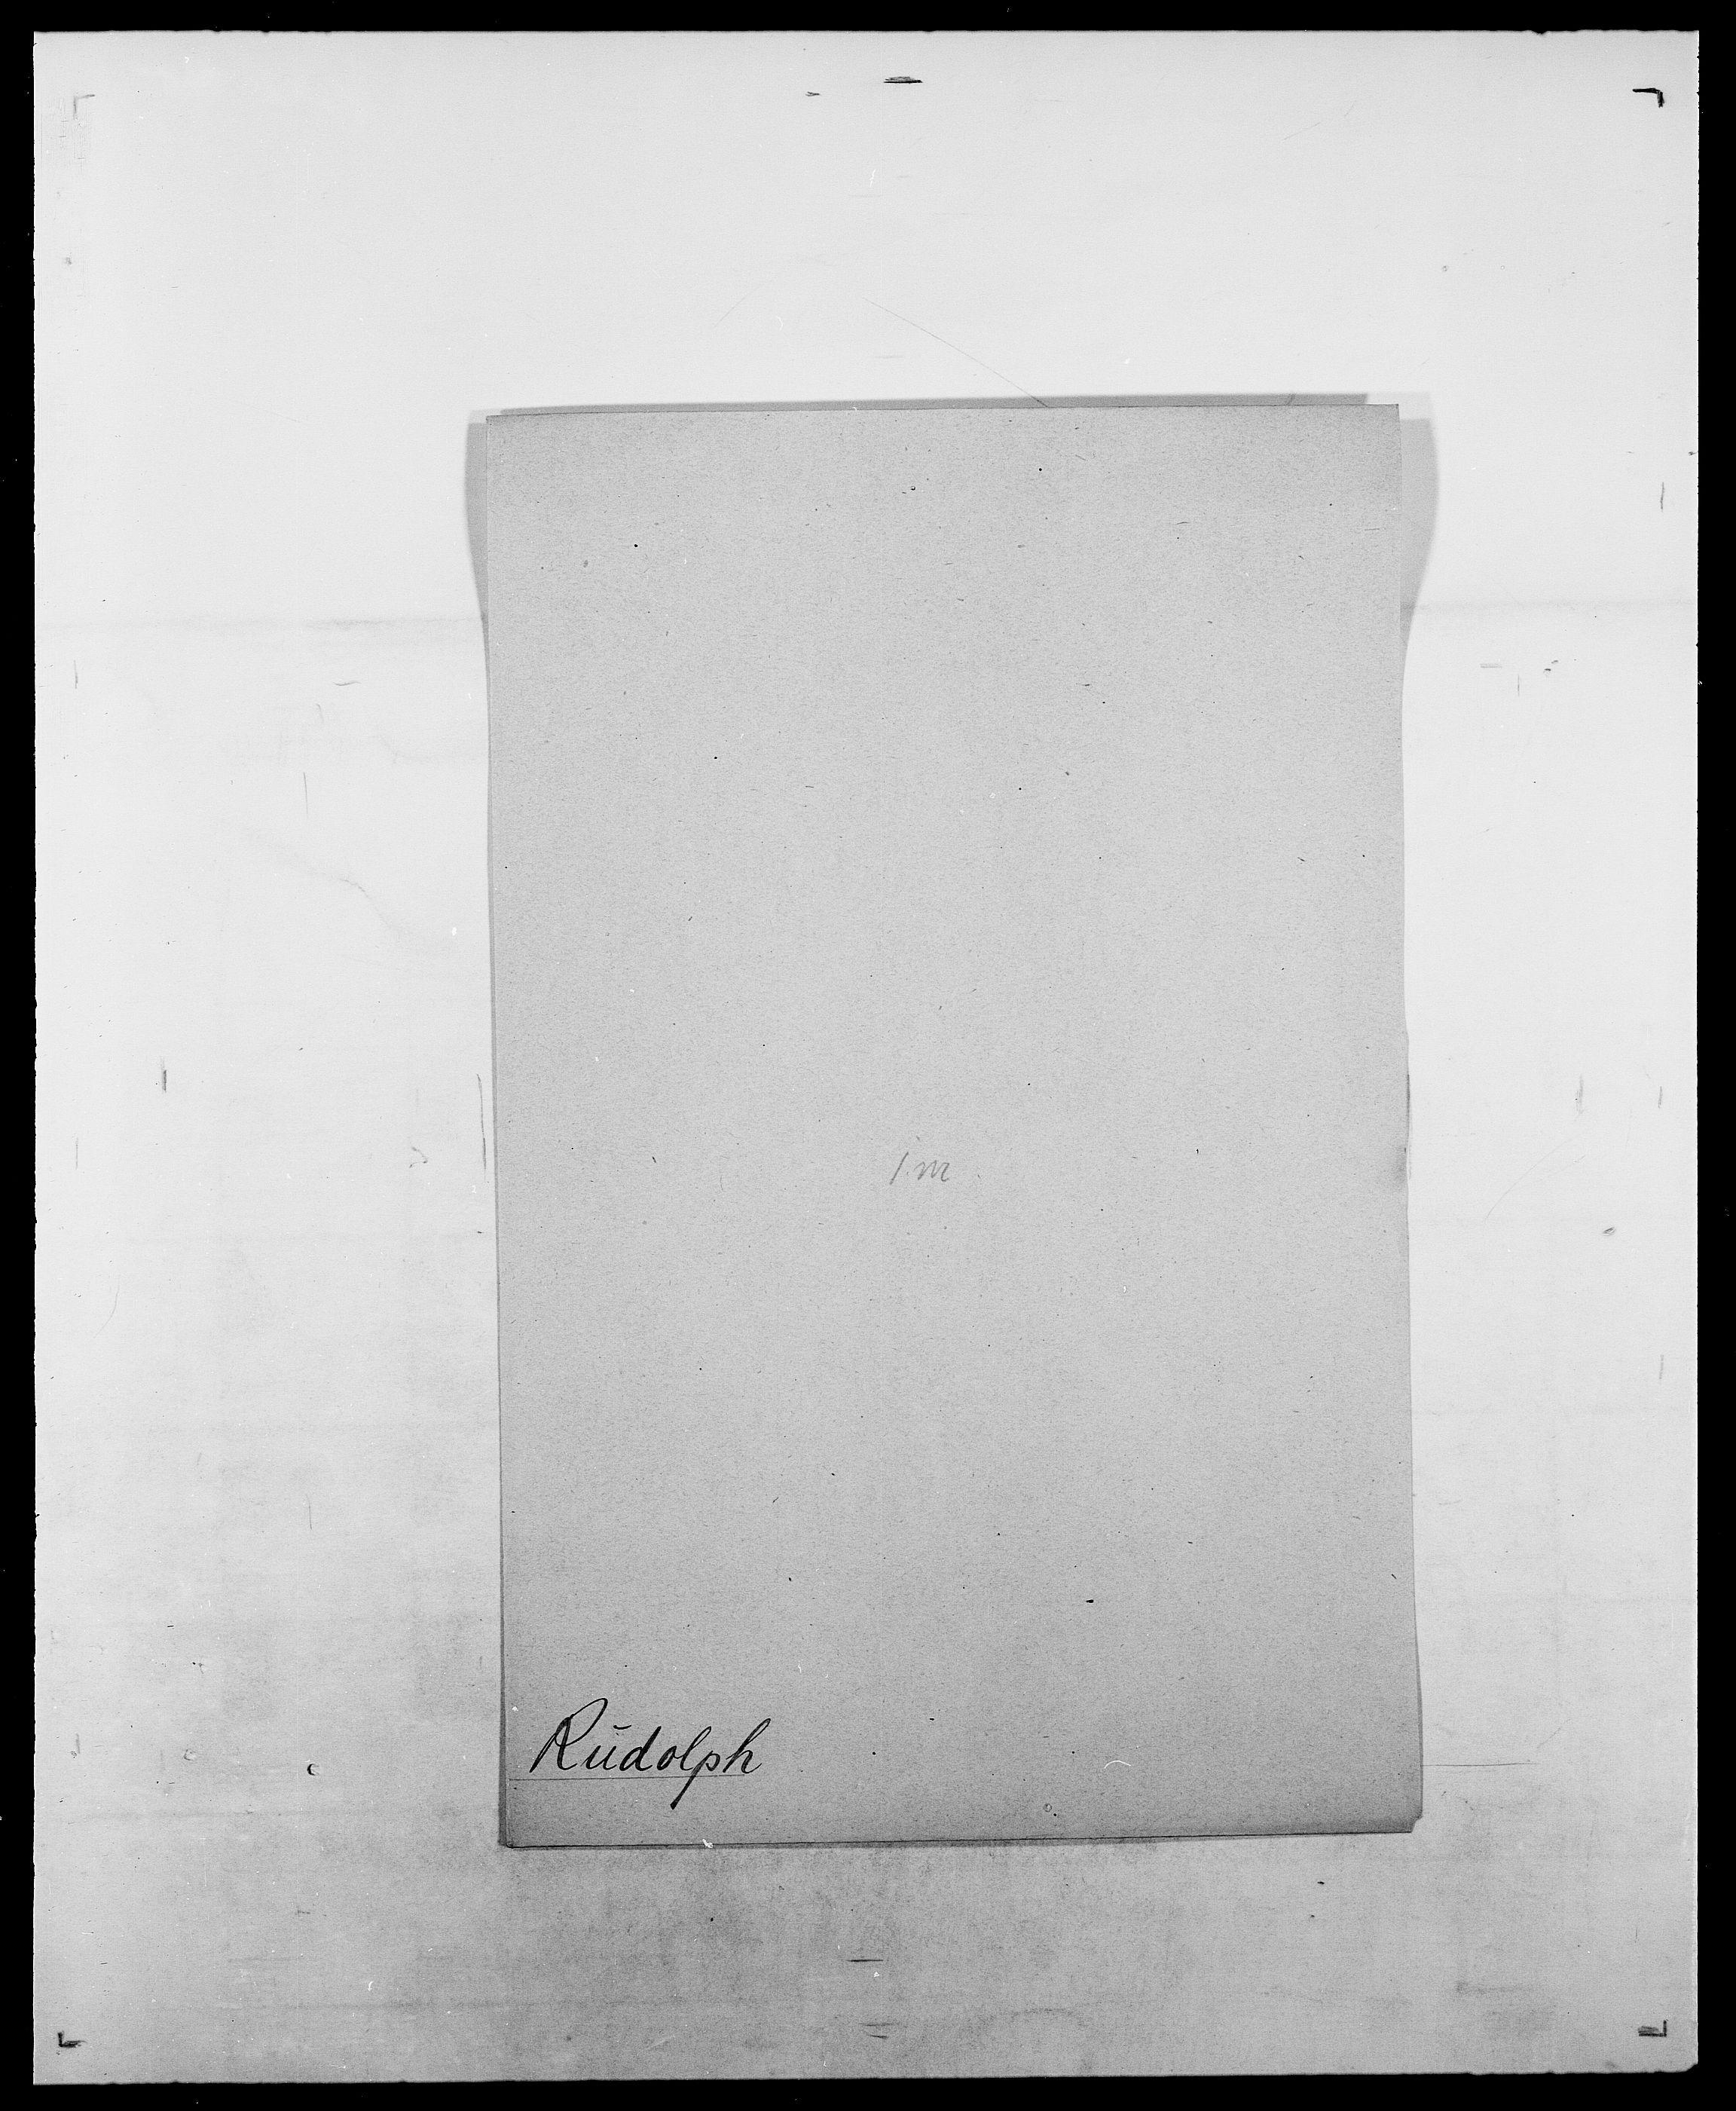 SAO, Delgobe, Charles Antoine - samling, D/Da/L0033: Roald - Røyem, s. 437